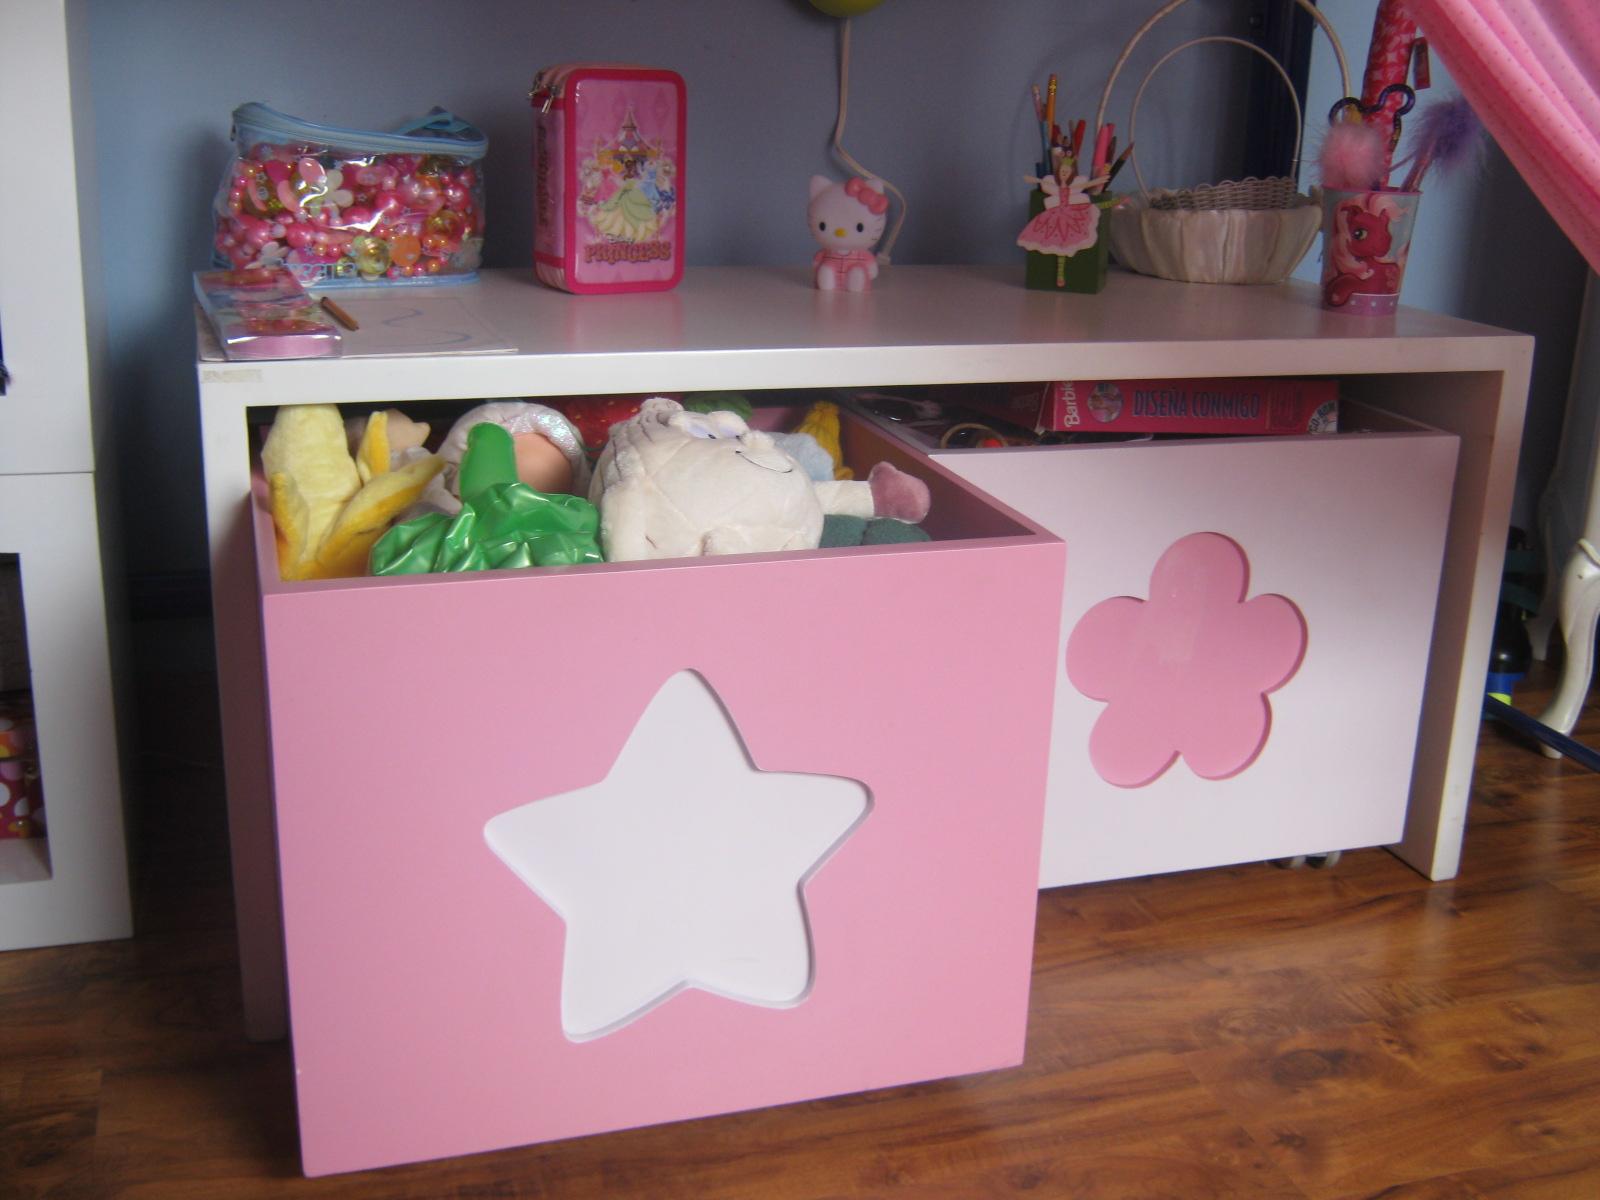 Arcones para guardar juguetes top bal para sentarse arcn arcn arcn muebles de jardn jardn box - Estanterias guardar juguetes ...